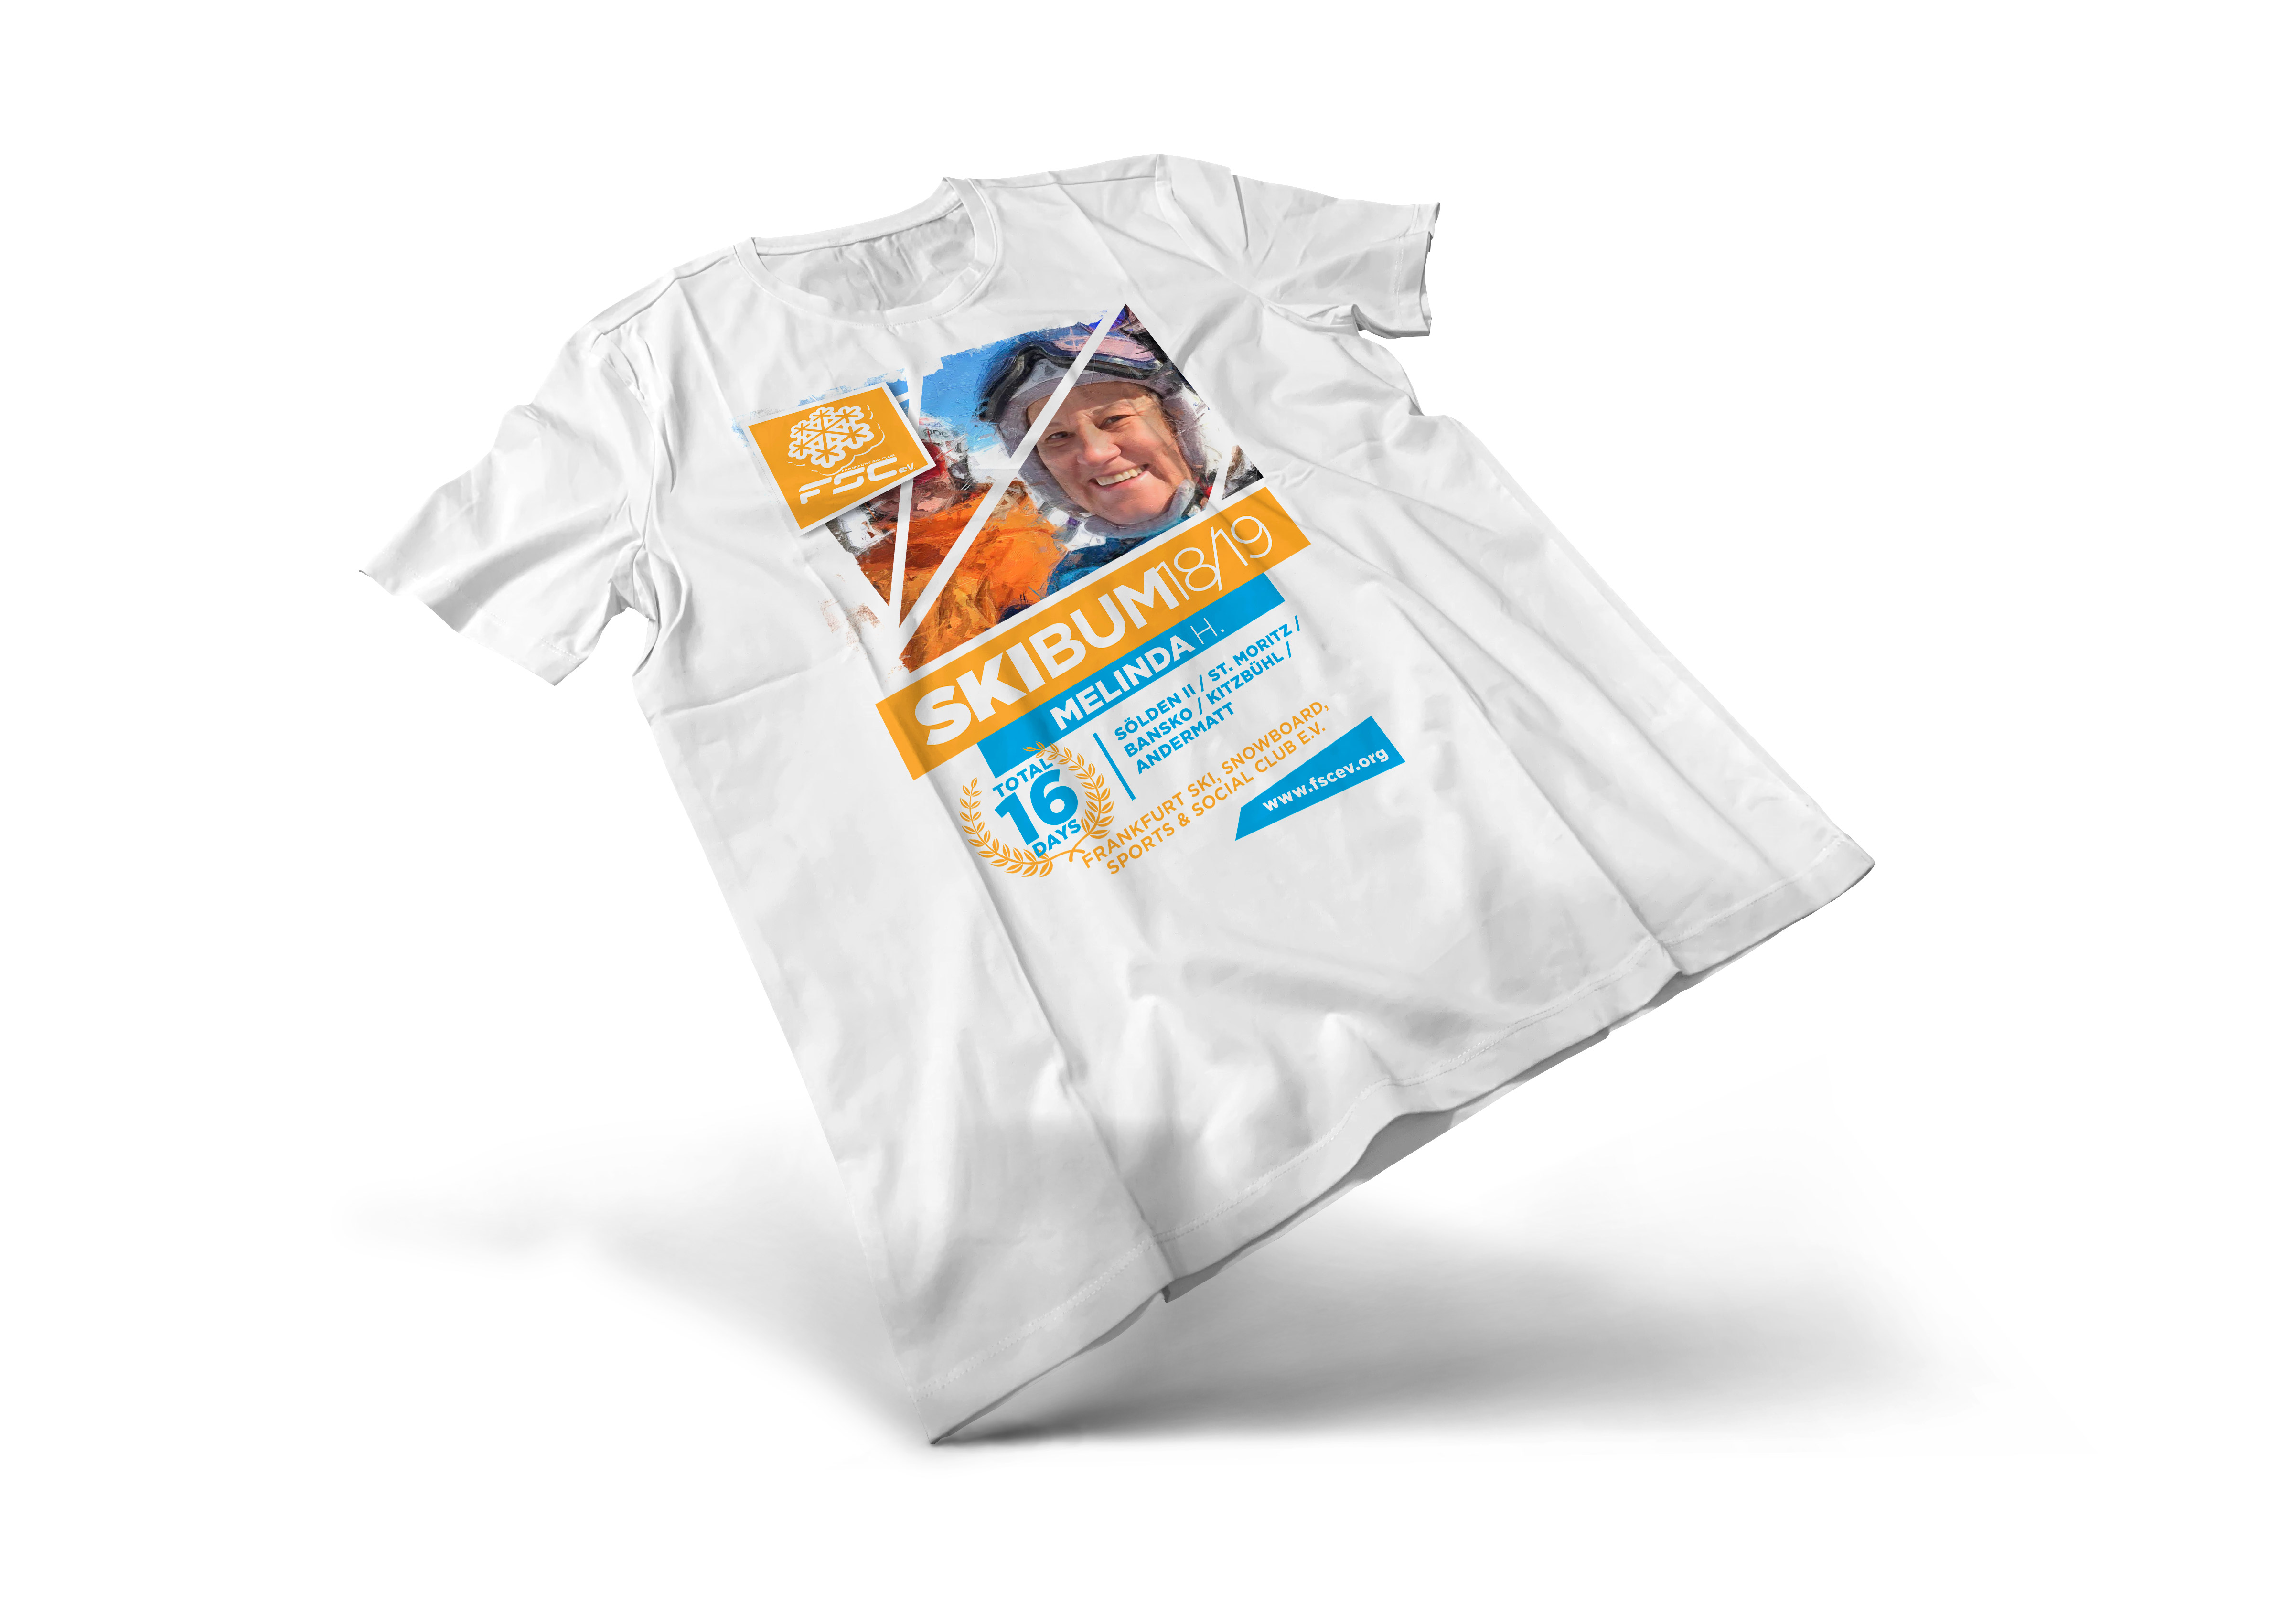 A FSC ski bum t-shirt.